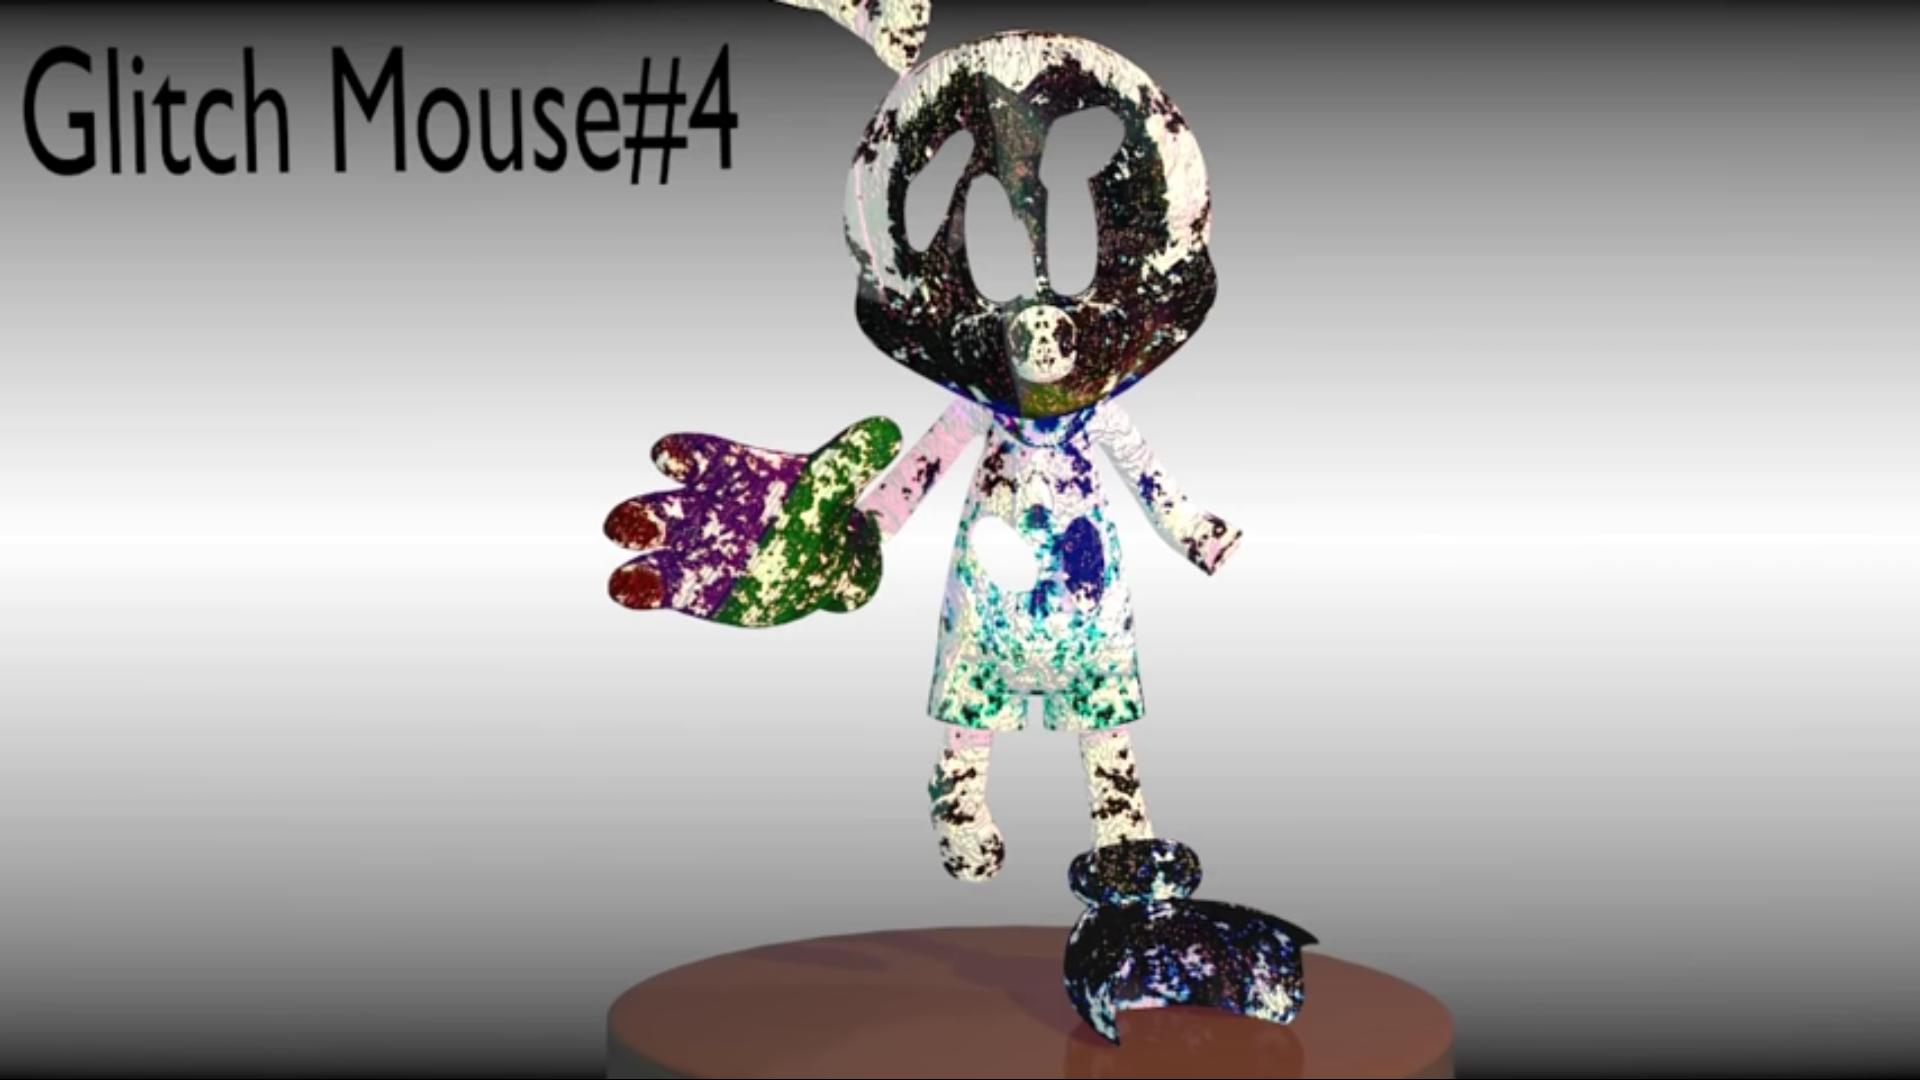 Glitch Mouse#4